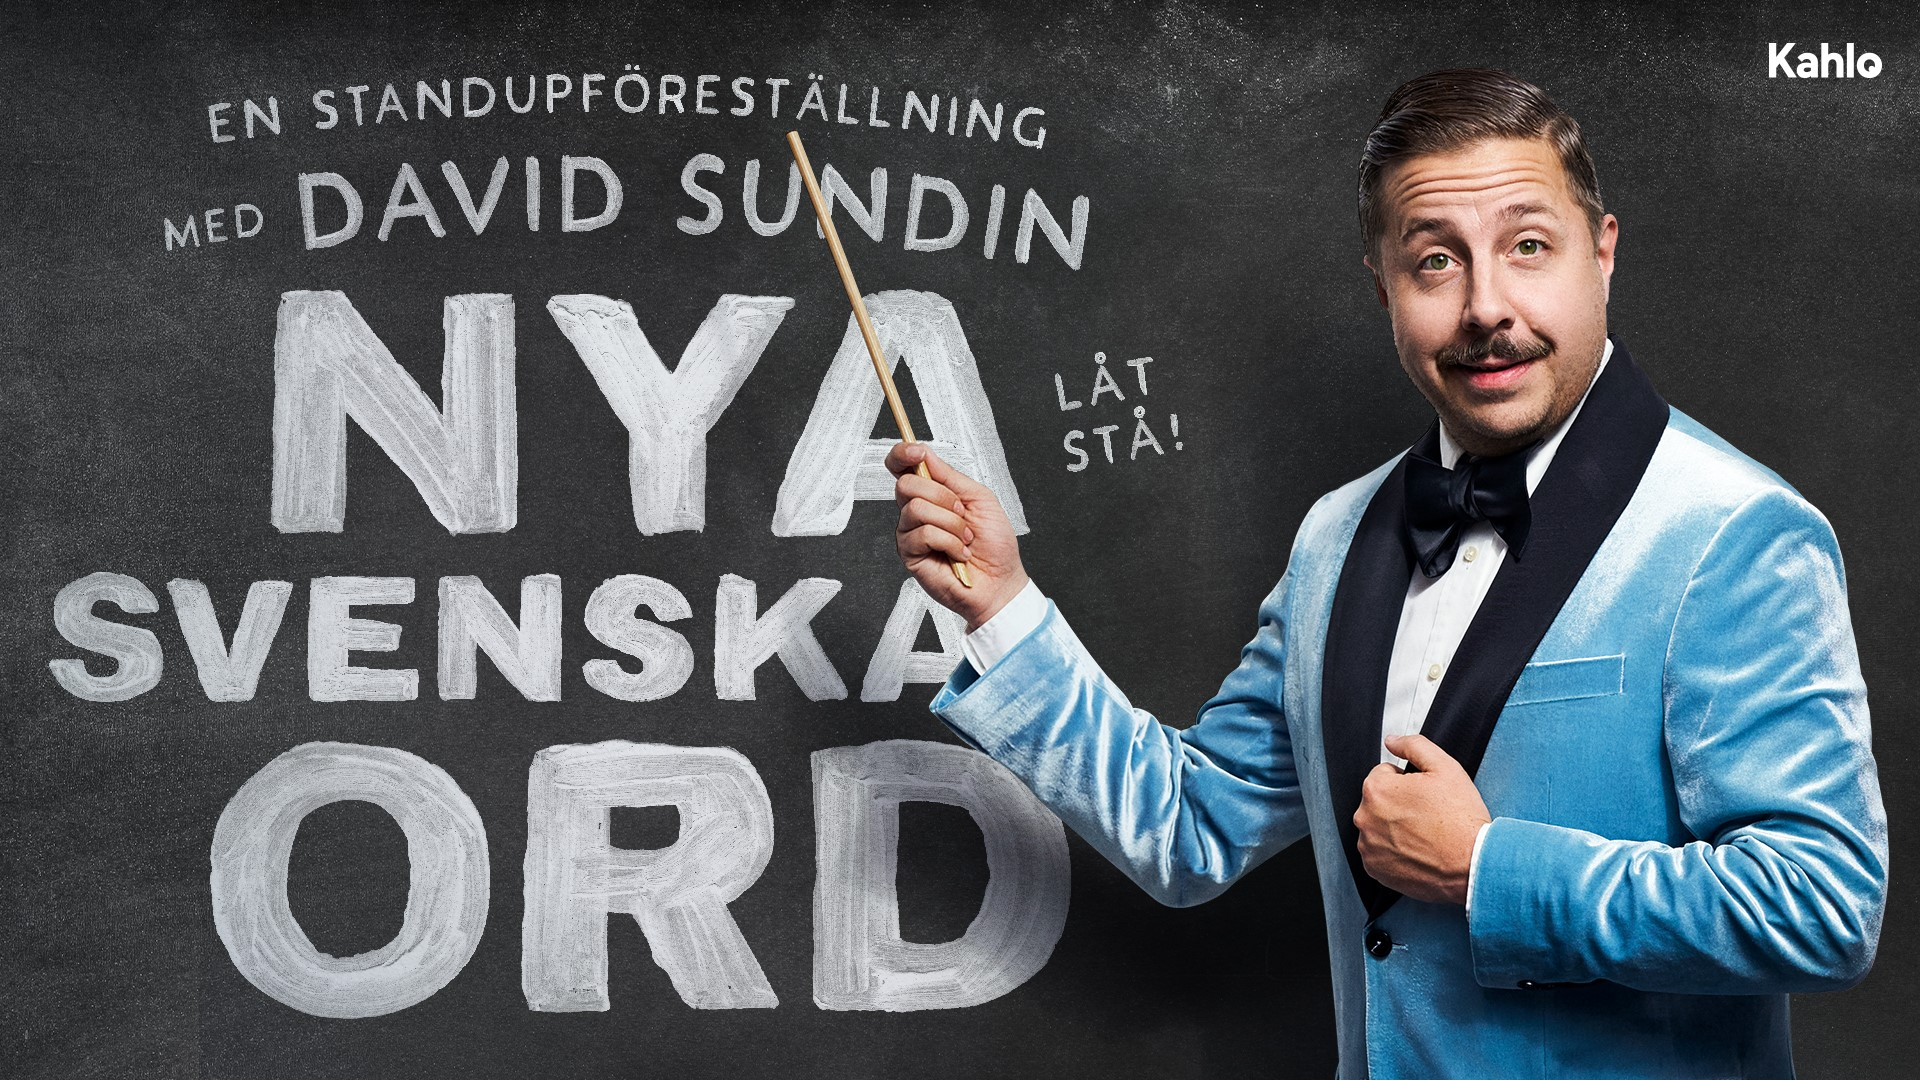 01015 Nya svenska ord 1920×1080